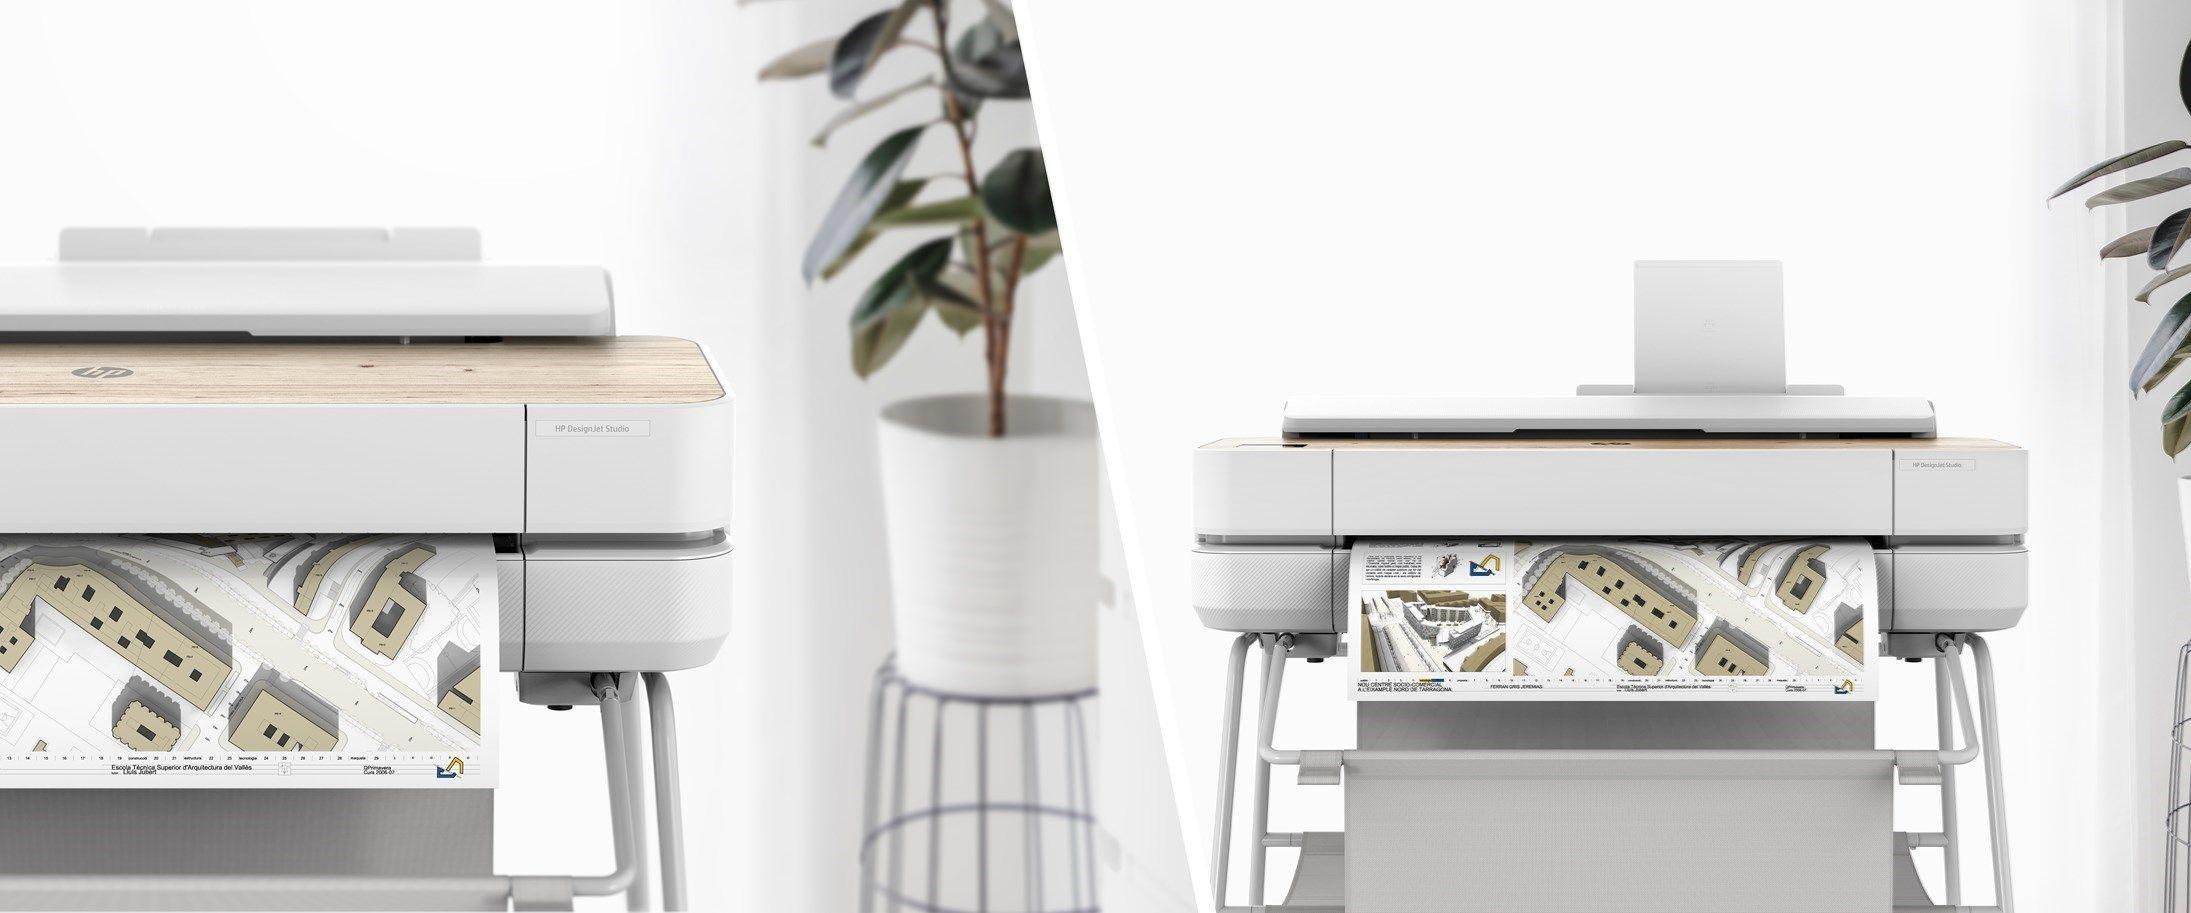 Stampanti HP DesignJet Studio, dispositivi di design